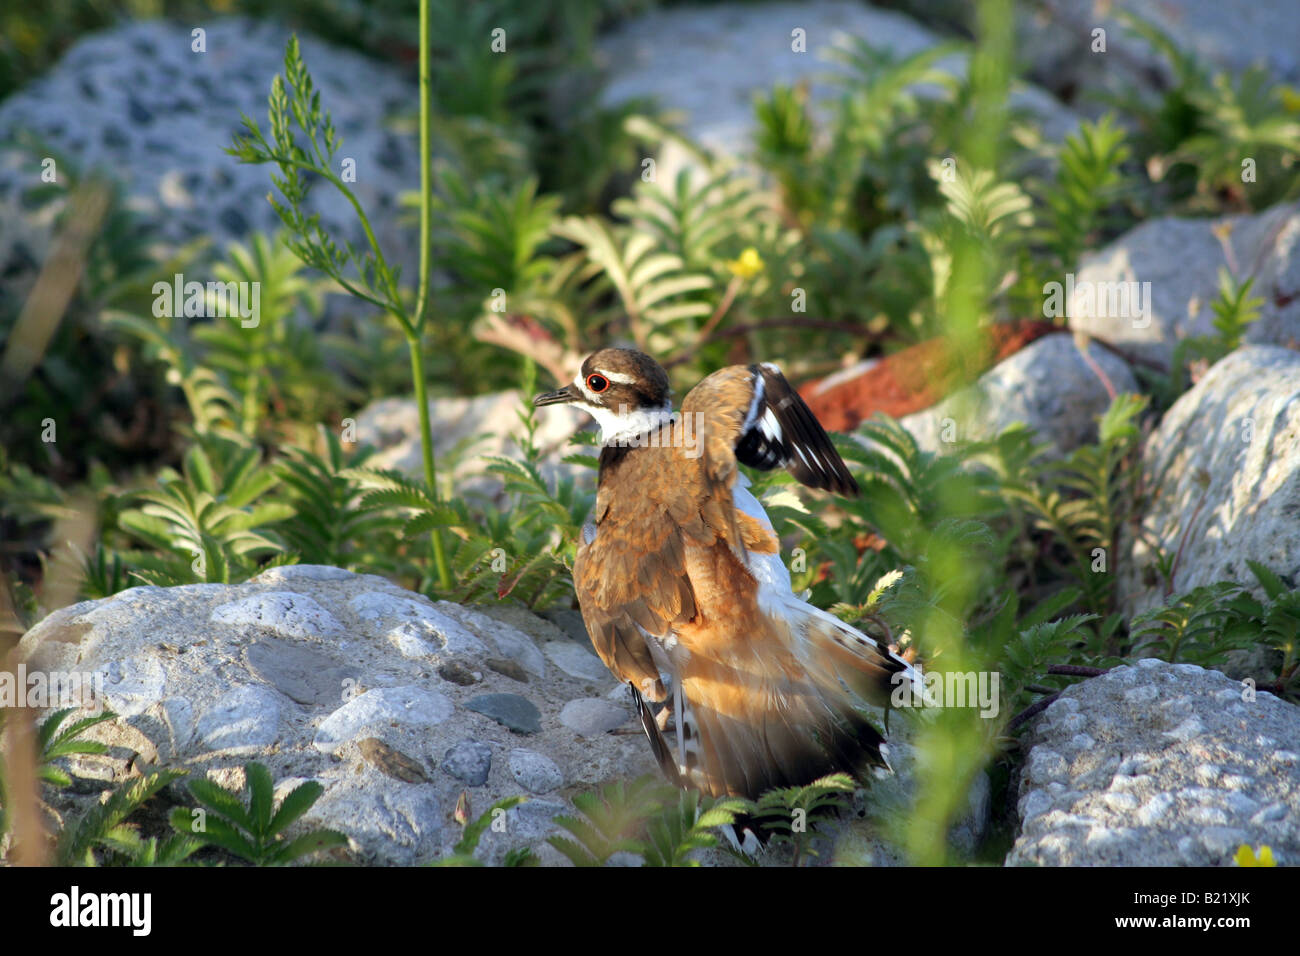 Killdeer defence tactics in nesting site in Colnel Samuel Smith Park, Toronto, Canada - Stock Image